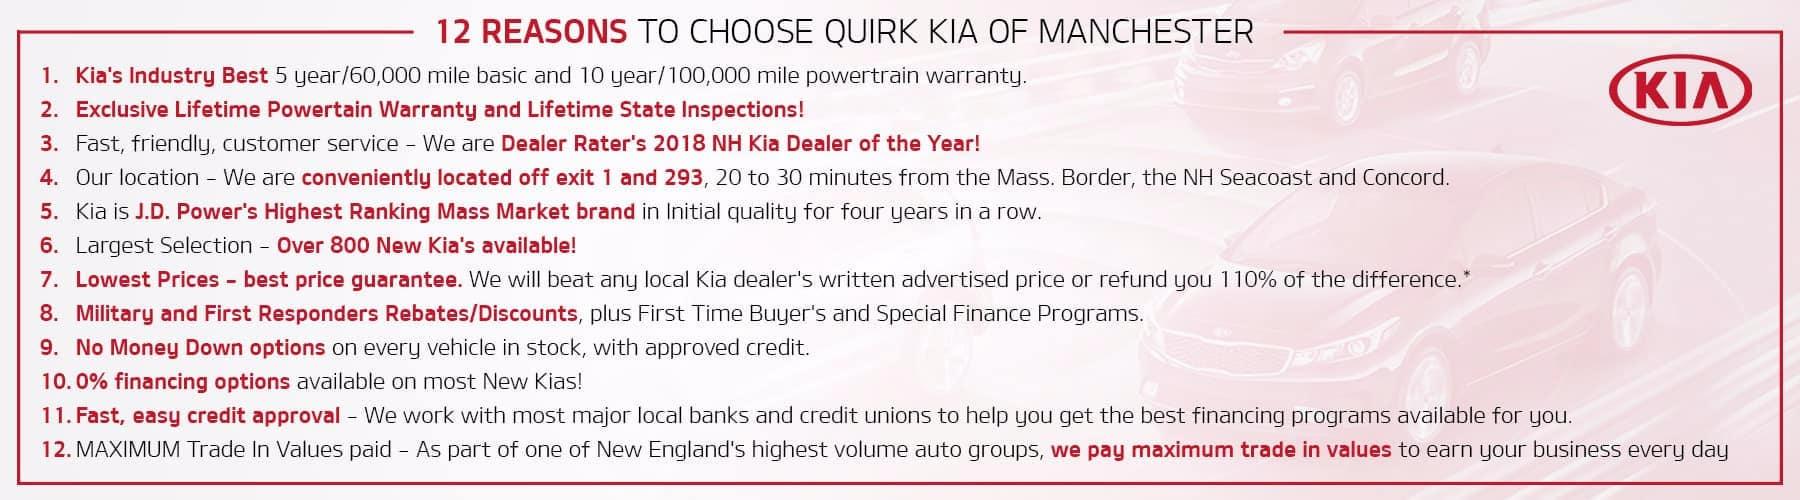 12 Reasons to Choose Quirk Kia